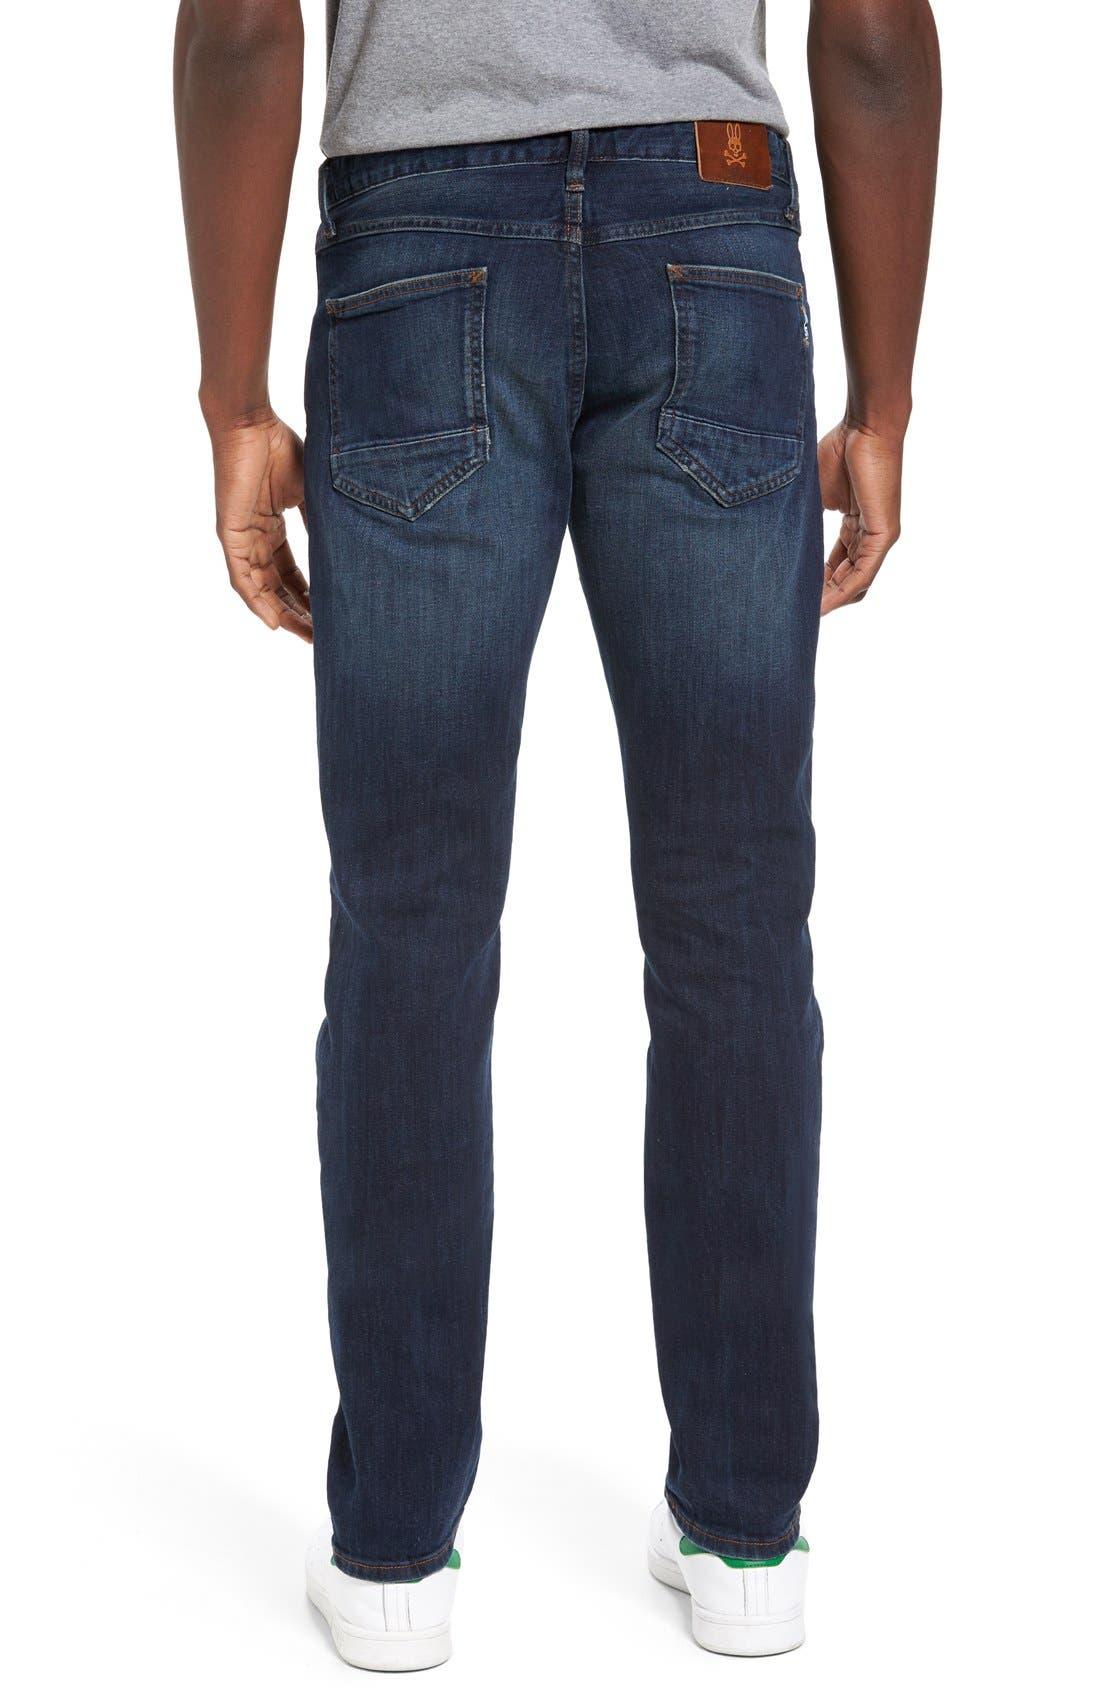 Spitfire Slim Fit Jeans,                             Alternate thumbnail 2, color,                             Indigo